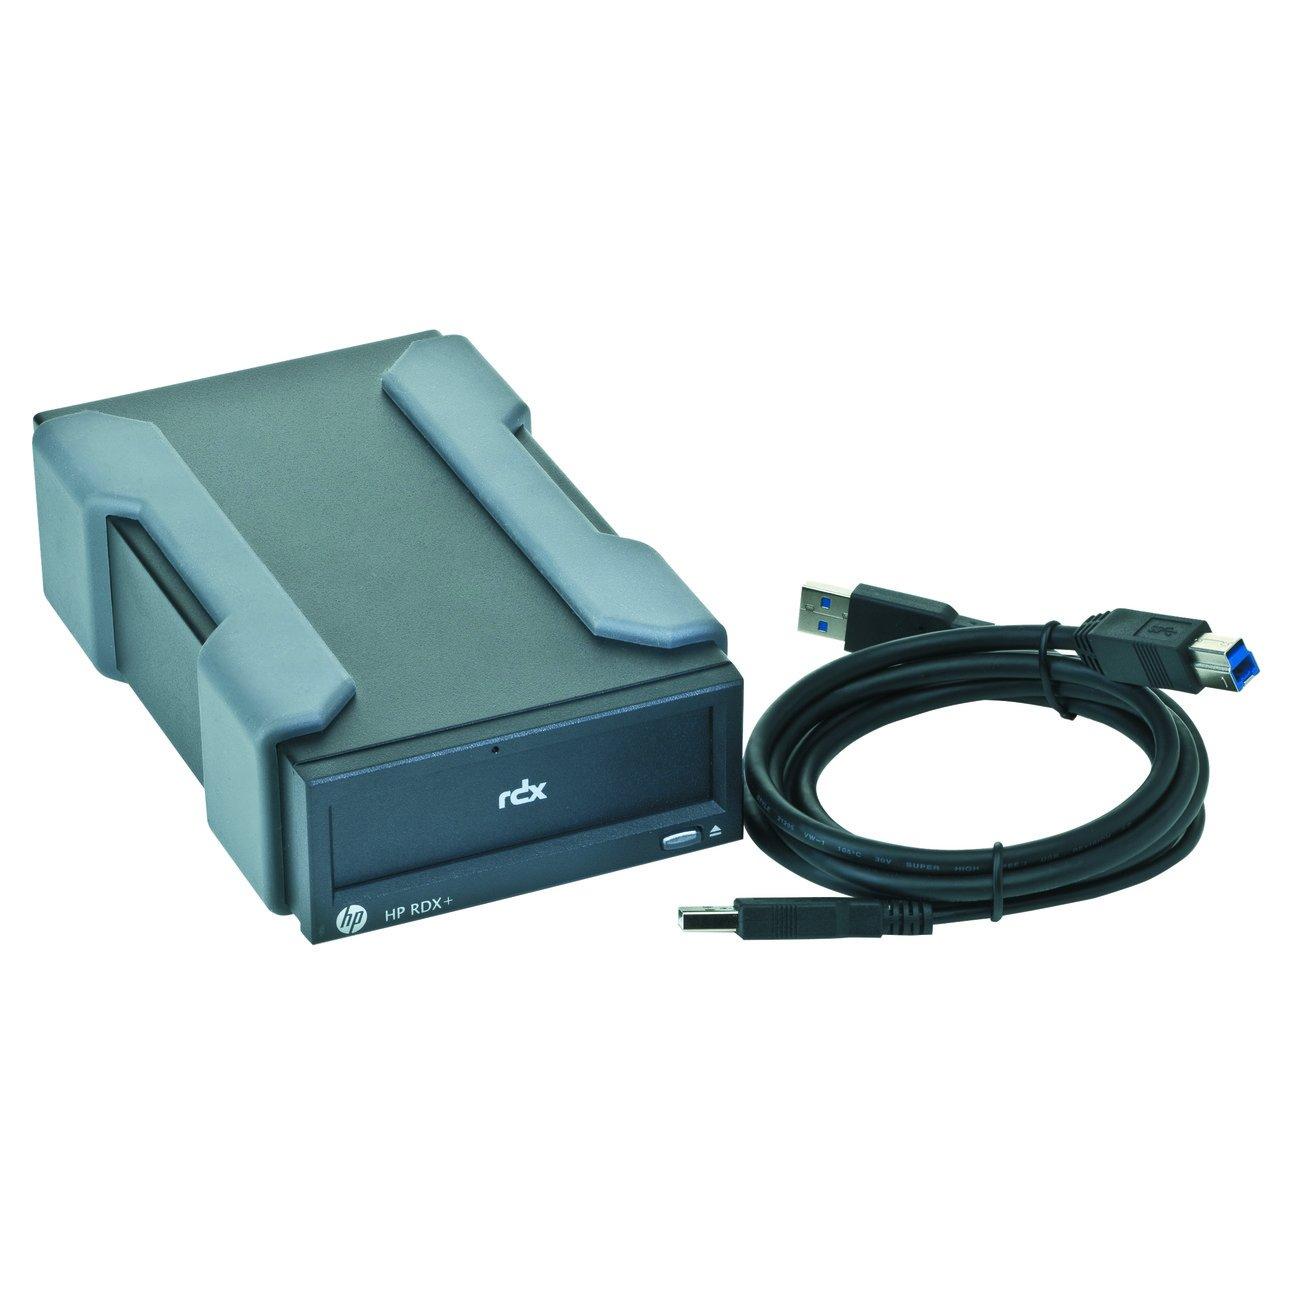 HP Rdx+ Removable Disk Backup System, 1 TB (B7B69B)